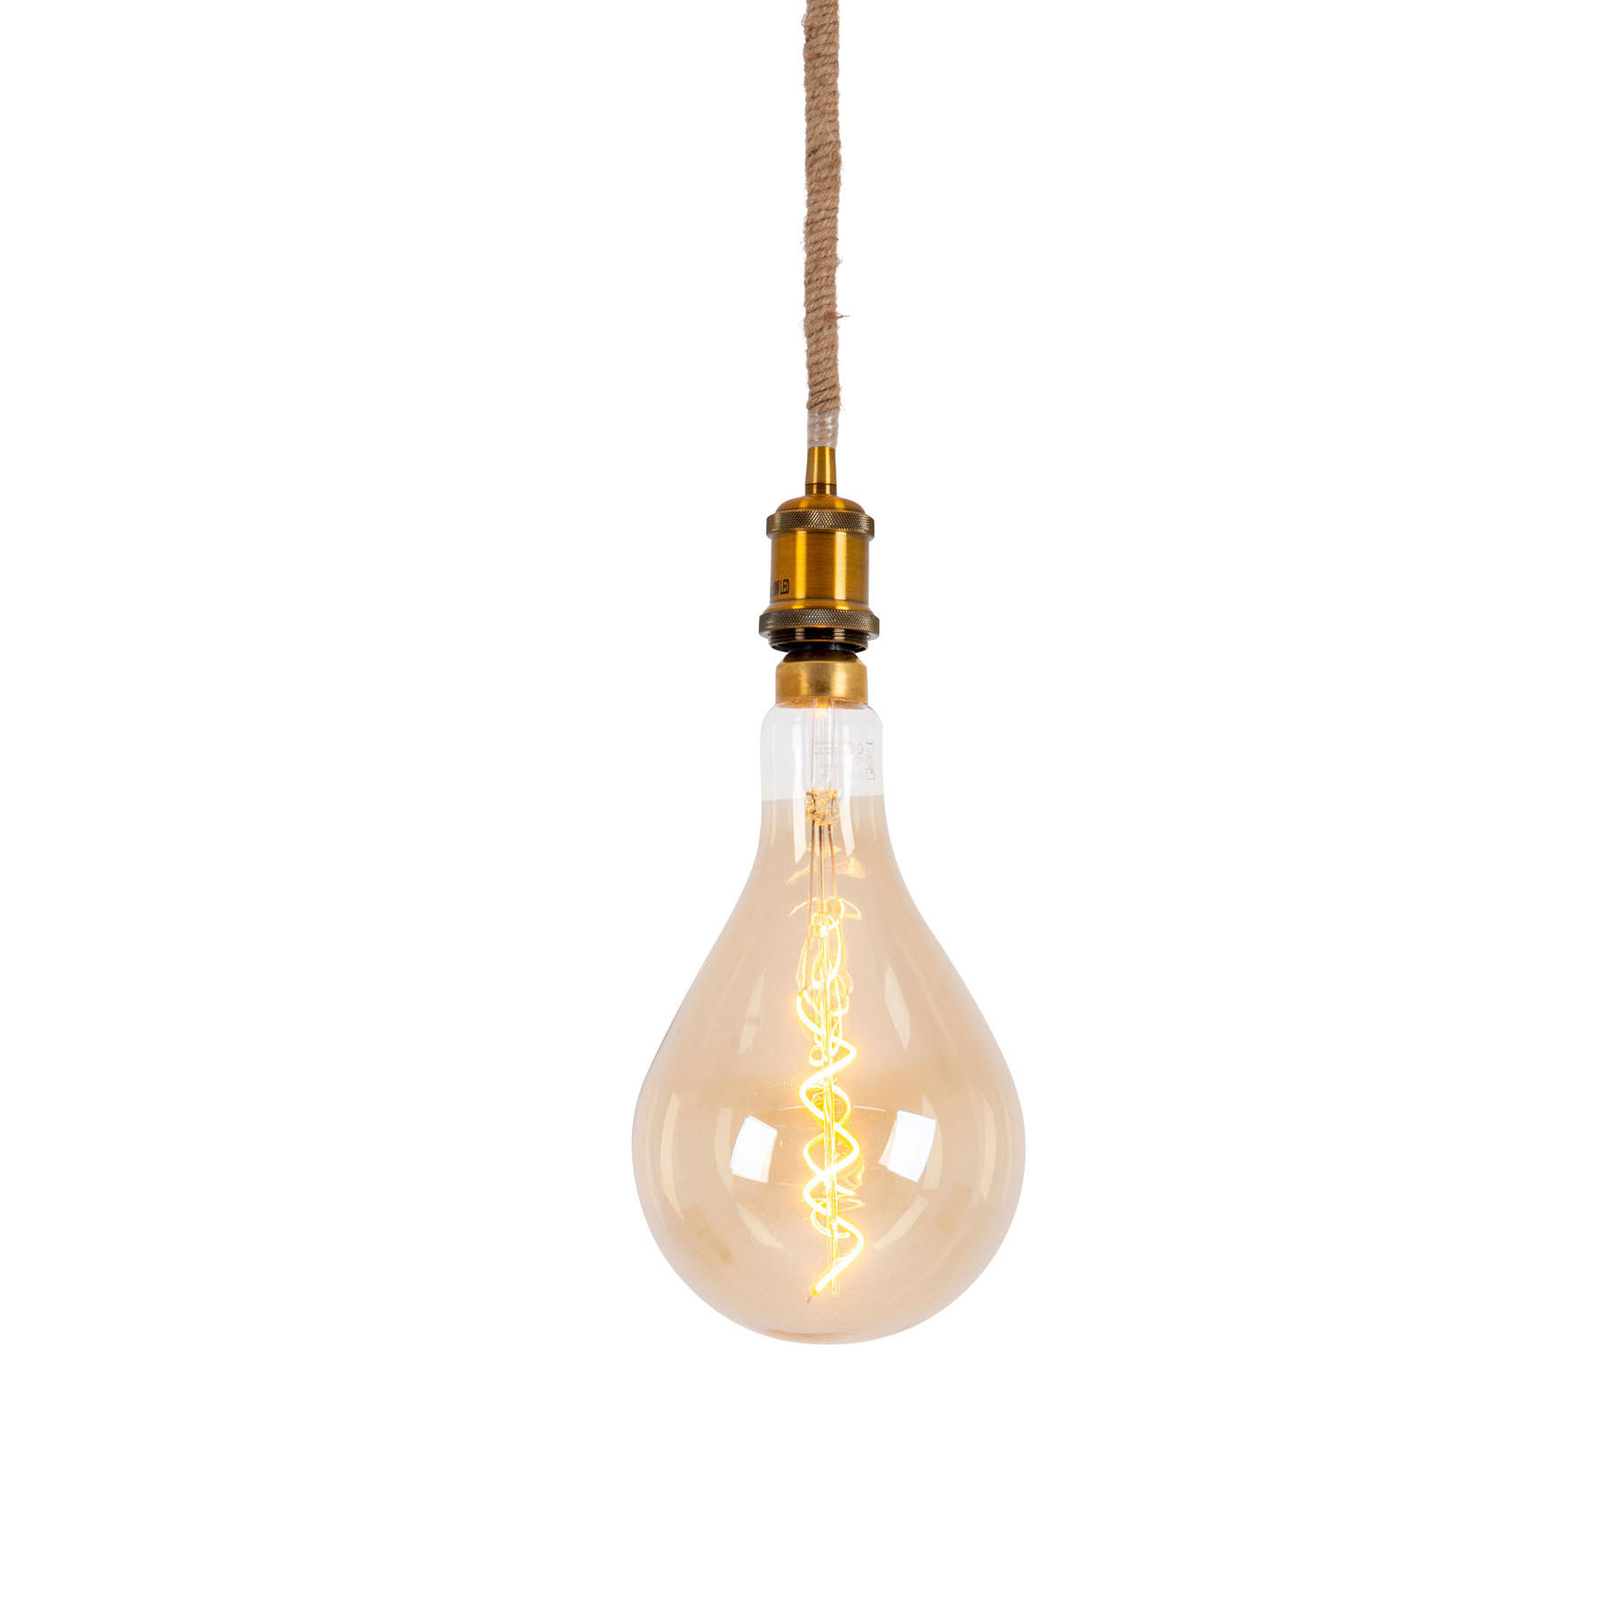 Lampa wisząca LED Ontario lina konopna, 1-punktowa